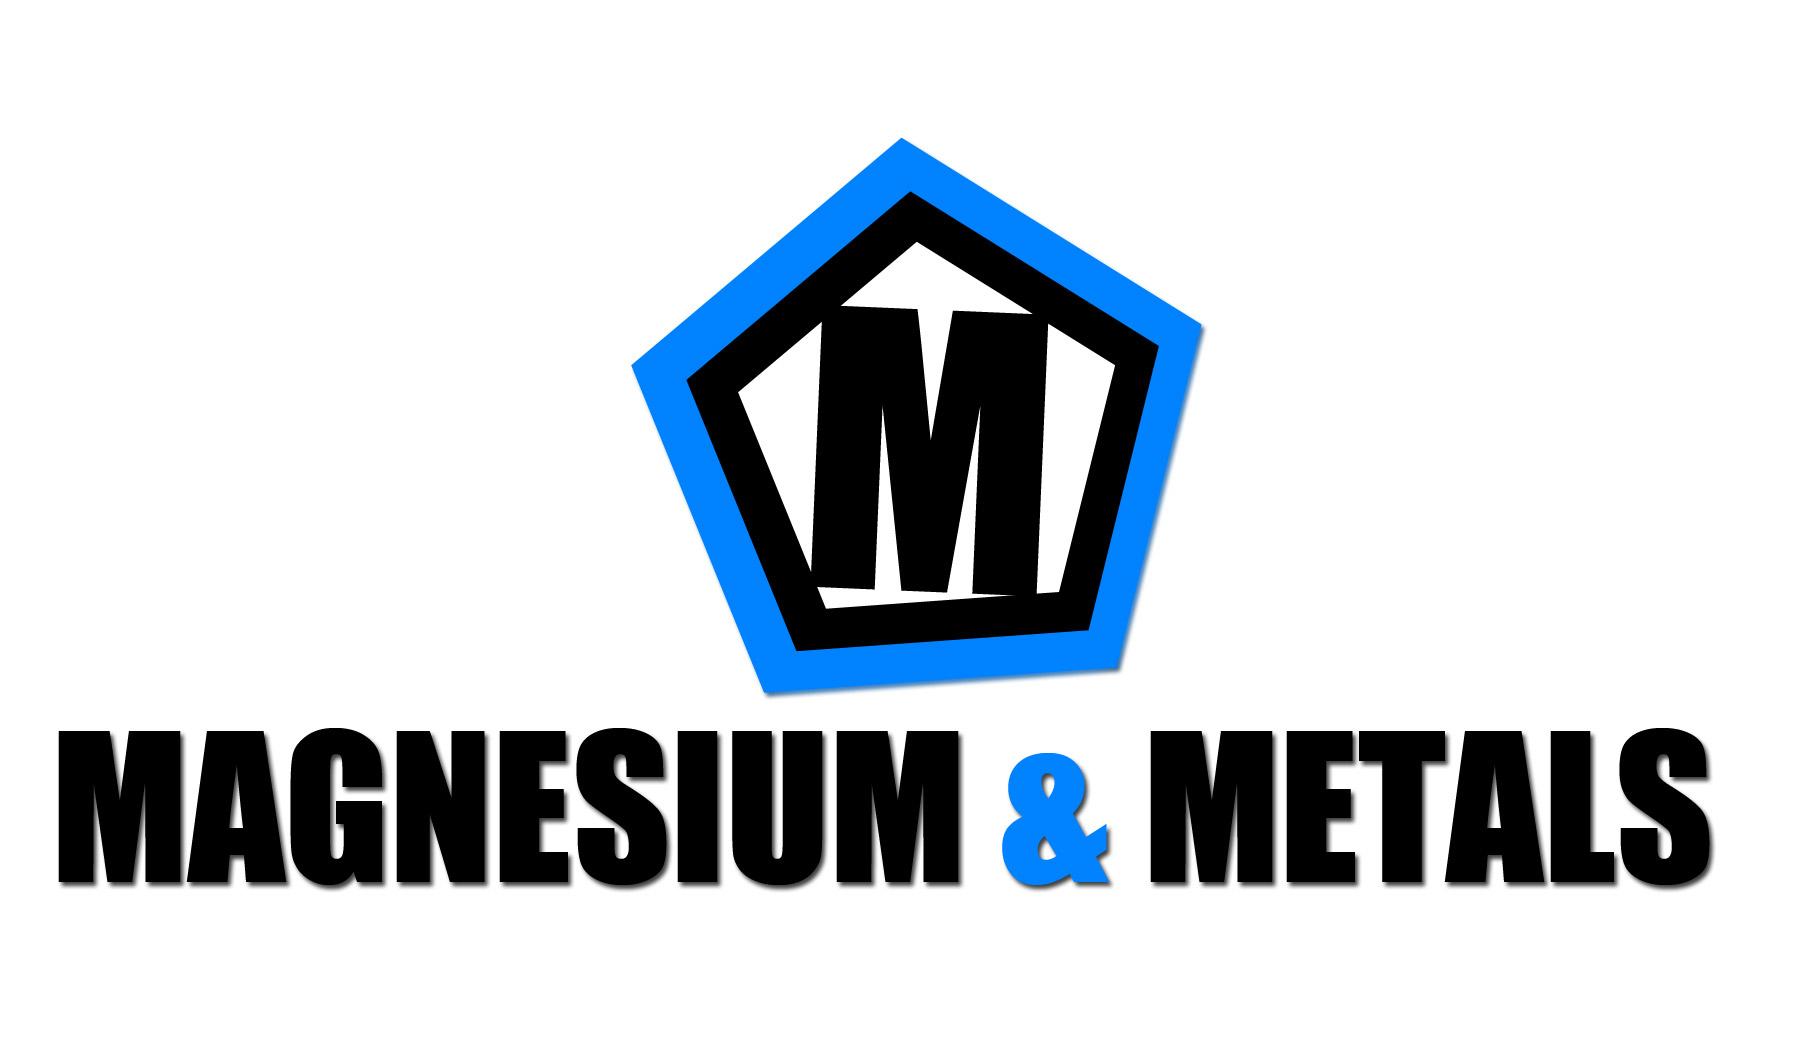 Логотип для проекта Magnesium&Metals фото f_4e7a362001a8c.jpg